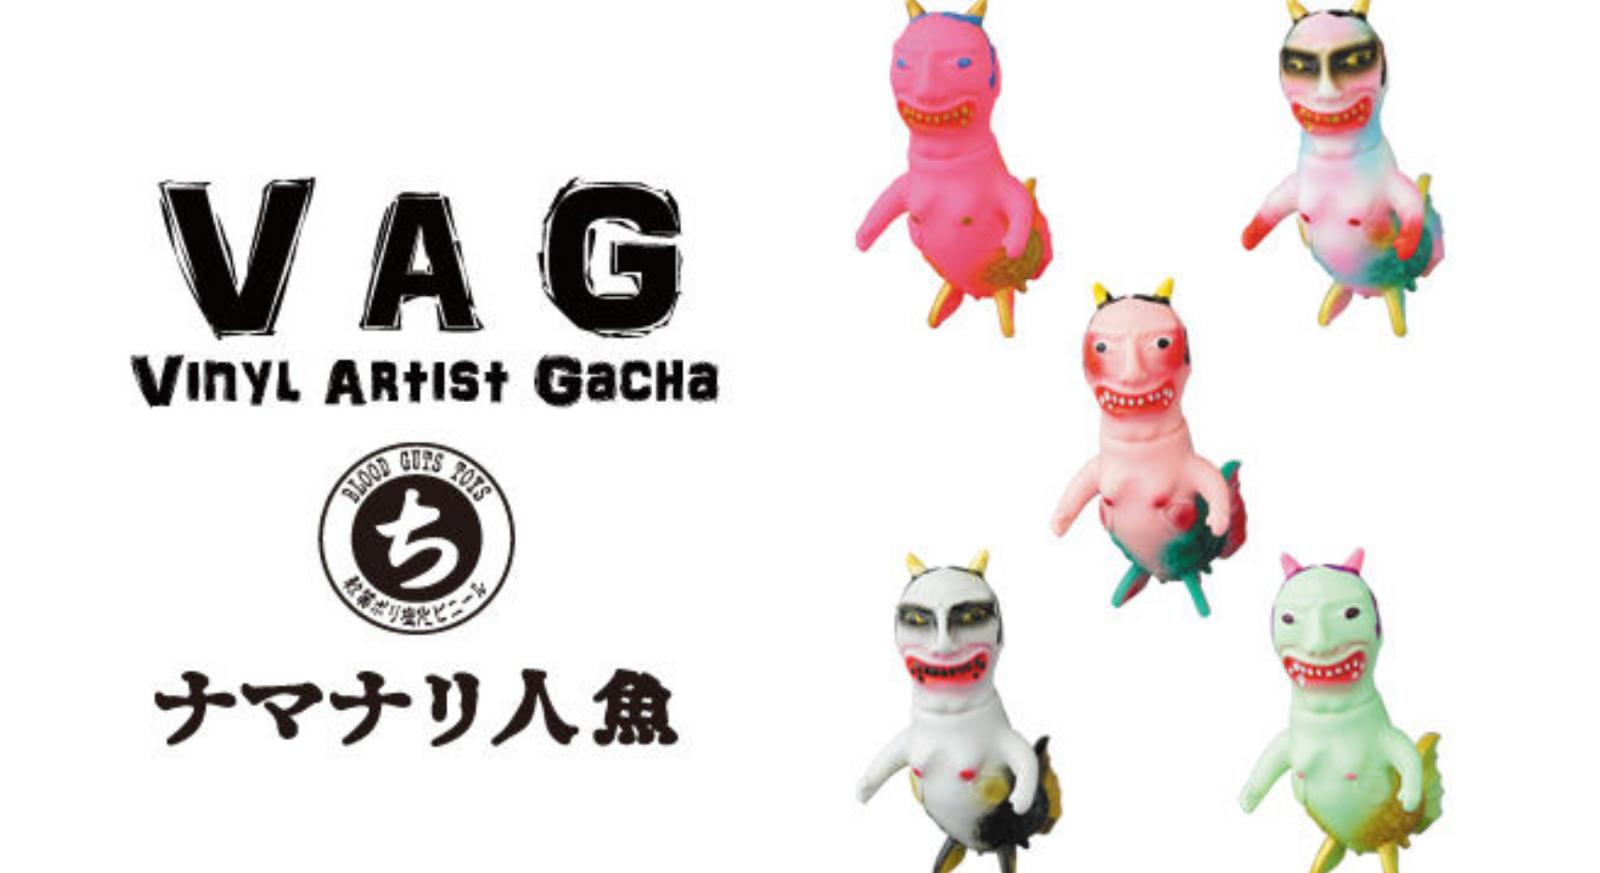 MEDICOM VAG Series 10 VINYL ARTIST GACHA Set Nauomoari Ningyo Blood Guts giocattoli